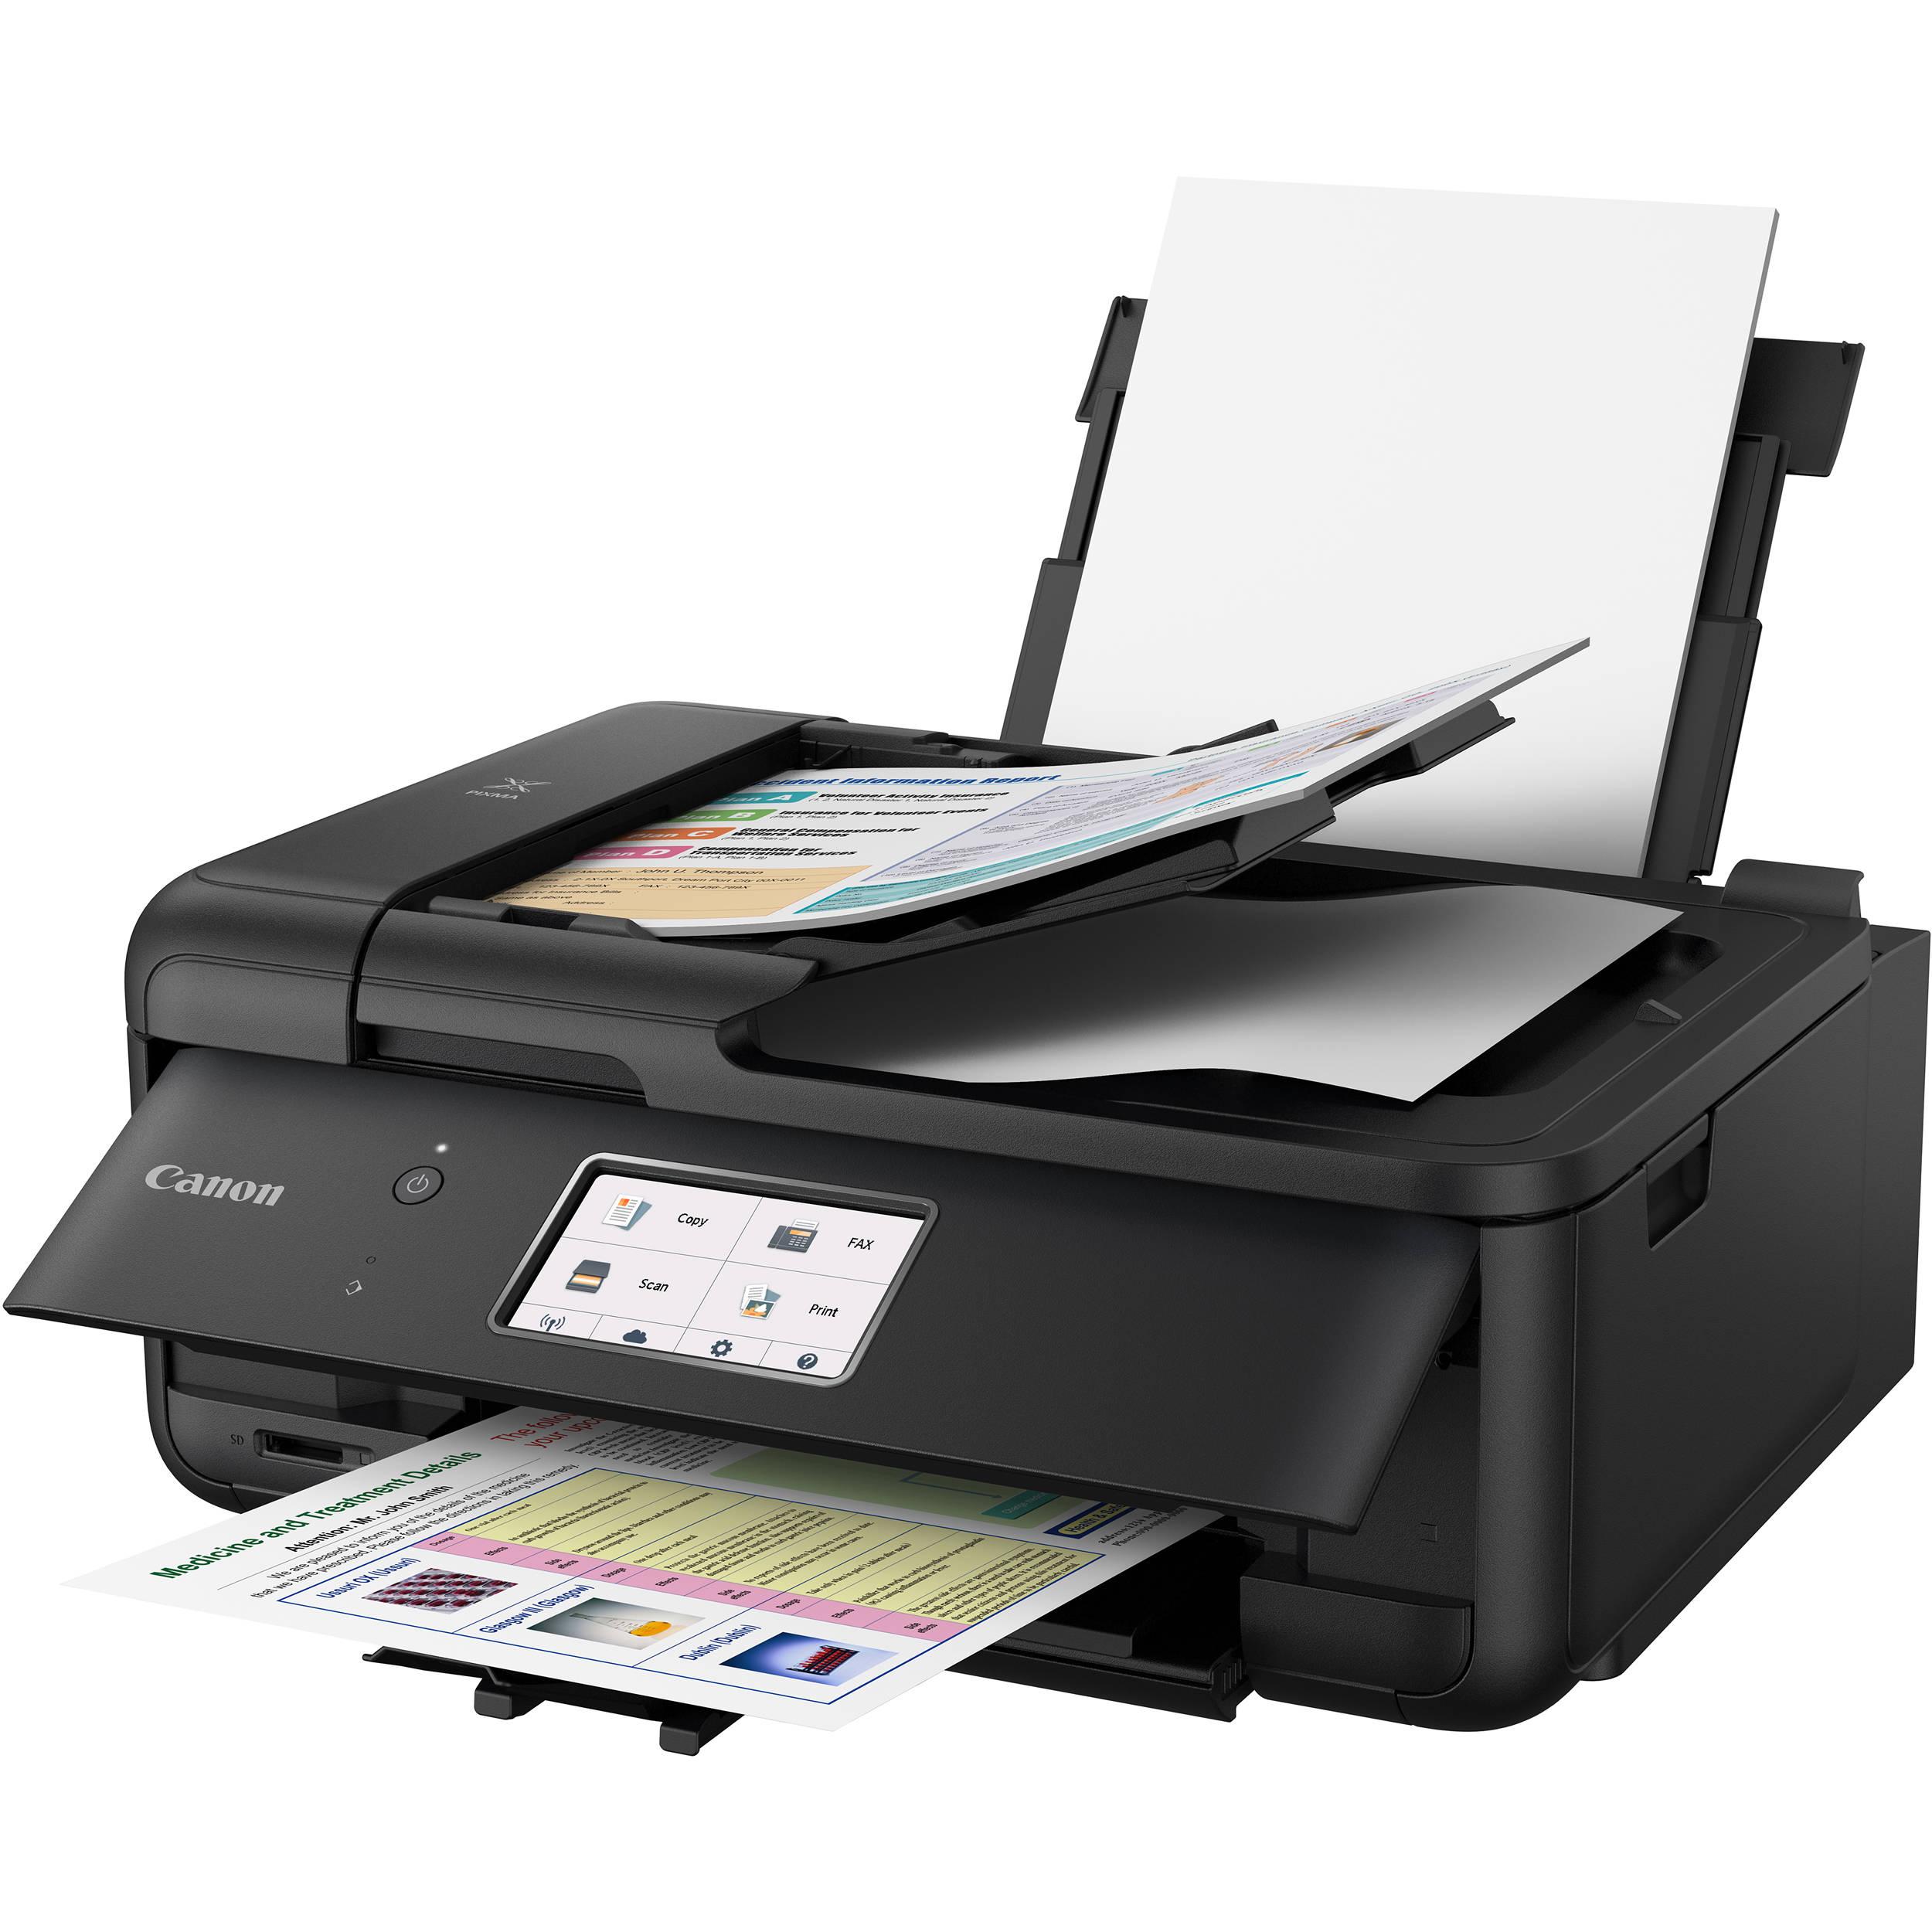 Canon Pixma Tr8520 Wireless Home Office All In One Inkjet Printer Black